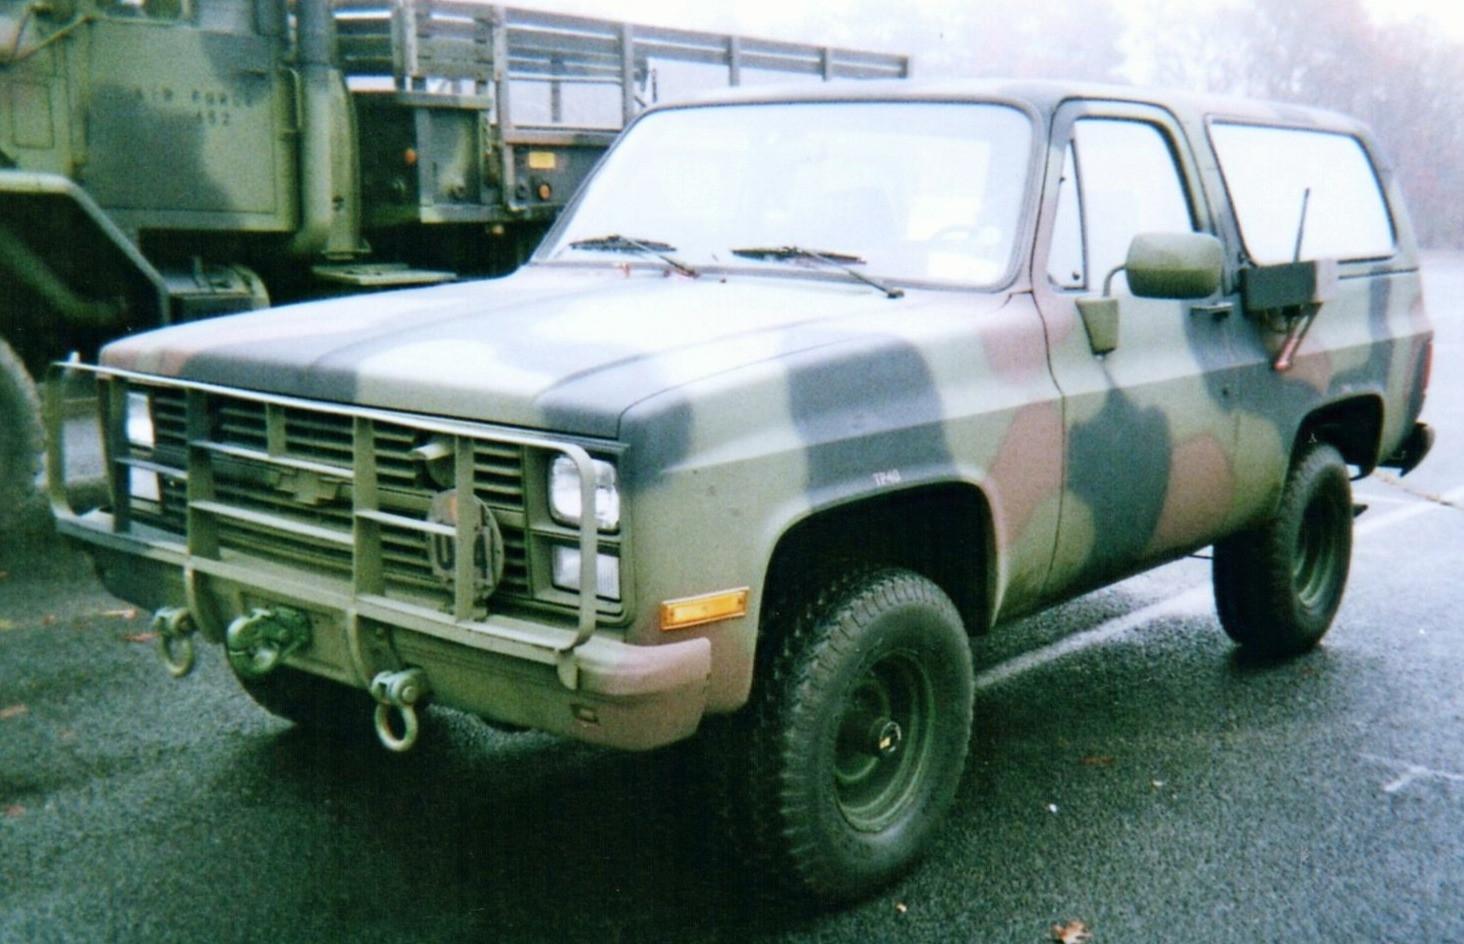 Fred Silver-Smith's 1985 Chevrolet military Blazer